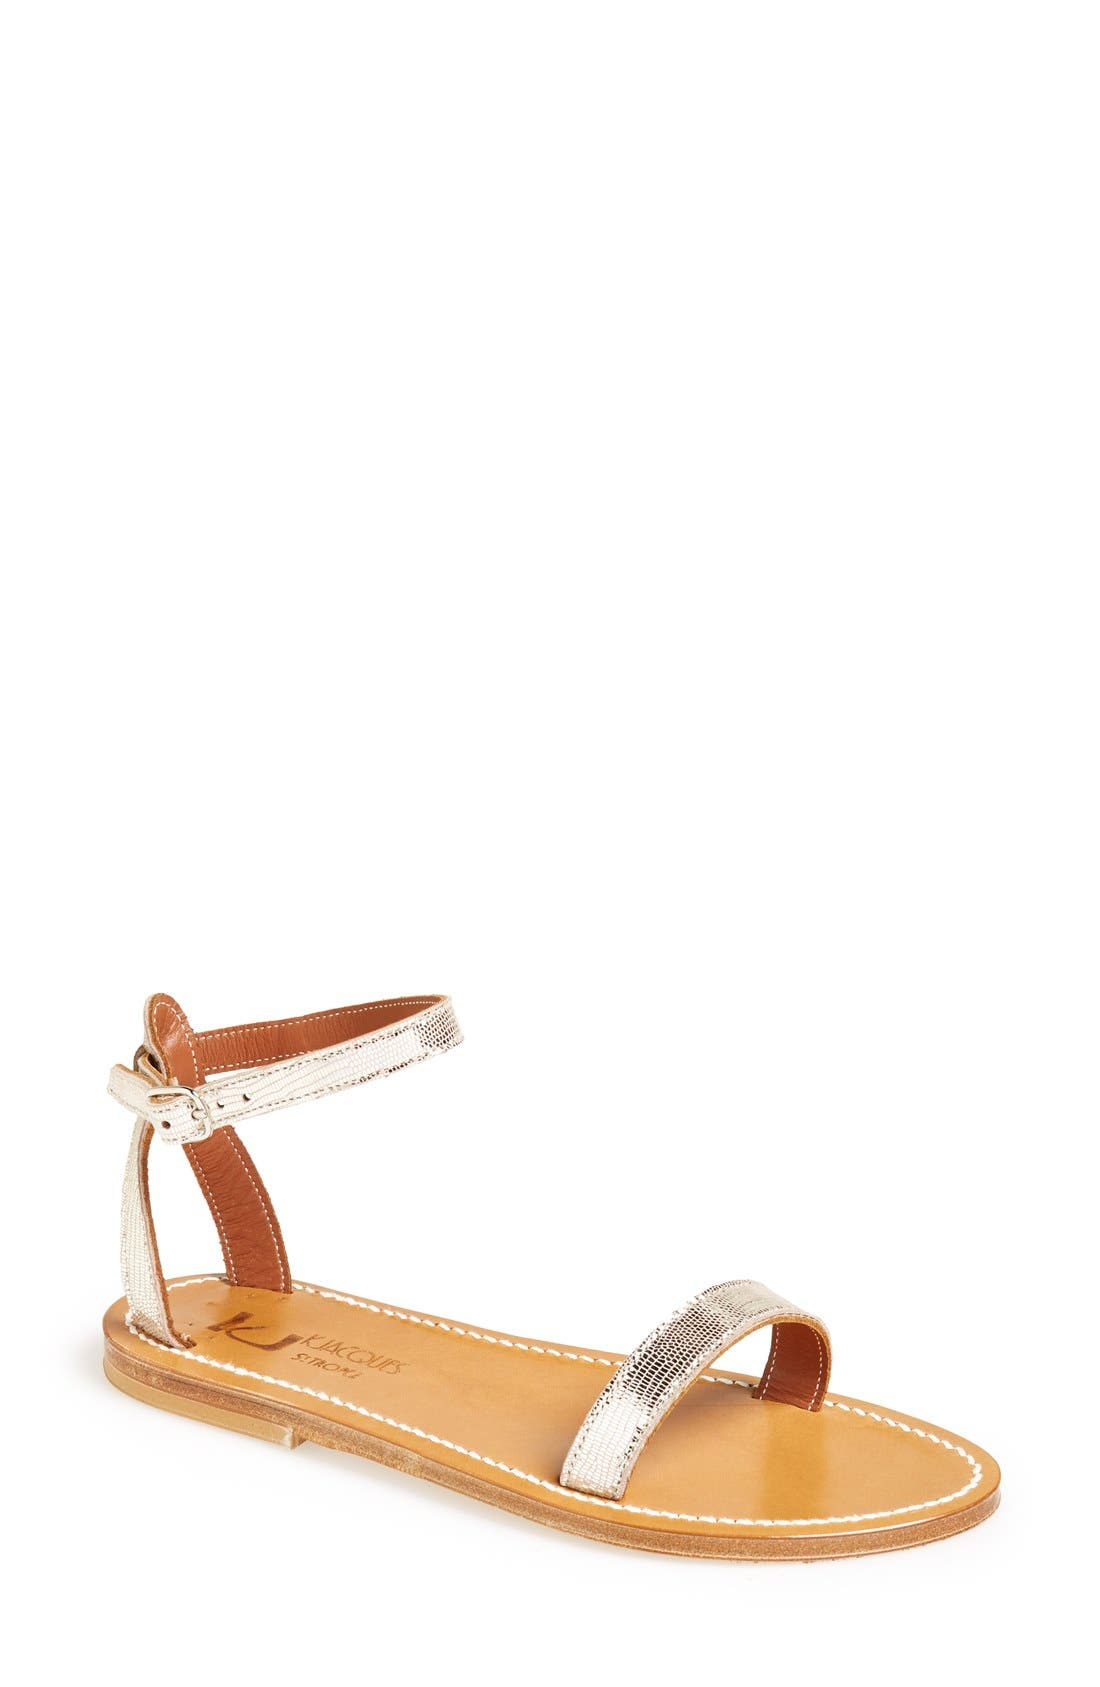 Alternate Image 1 Selected - K.Jacques St. Tropez 'Laura' Ankle Strap Sandal (Women)